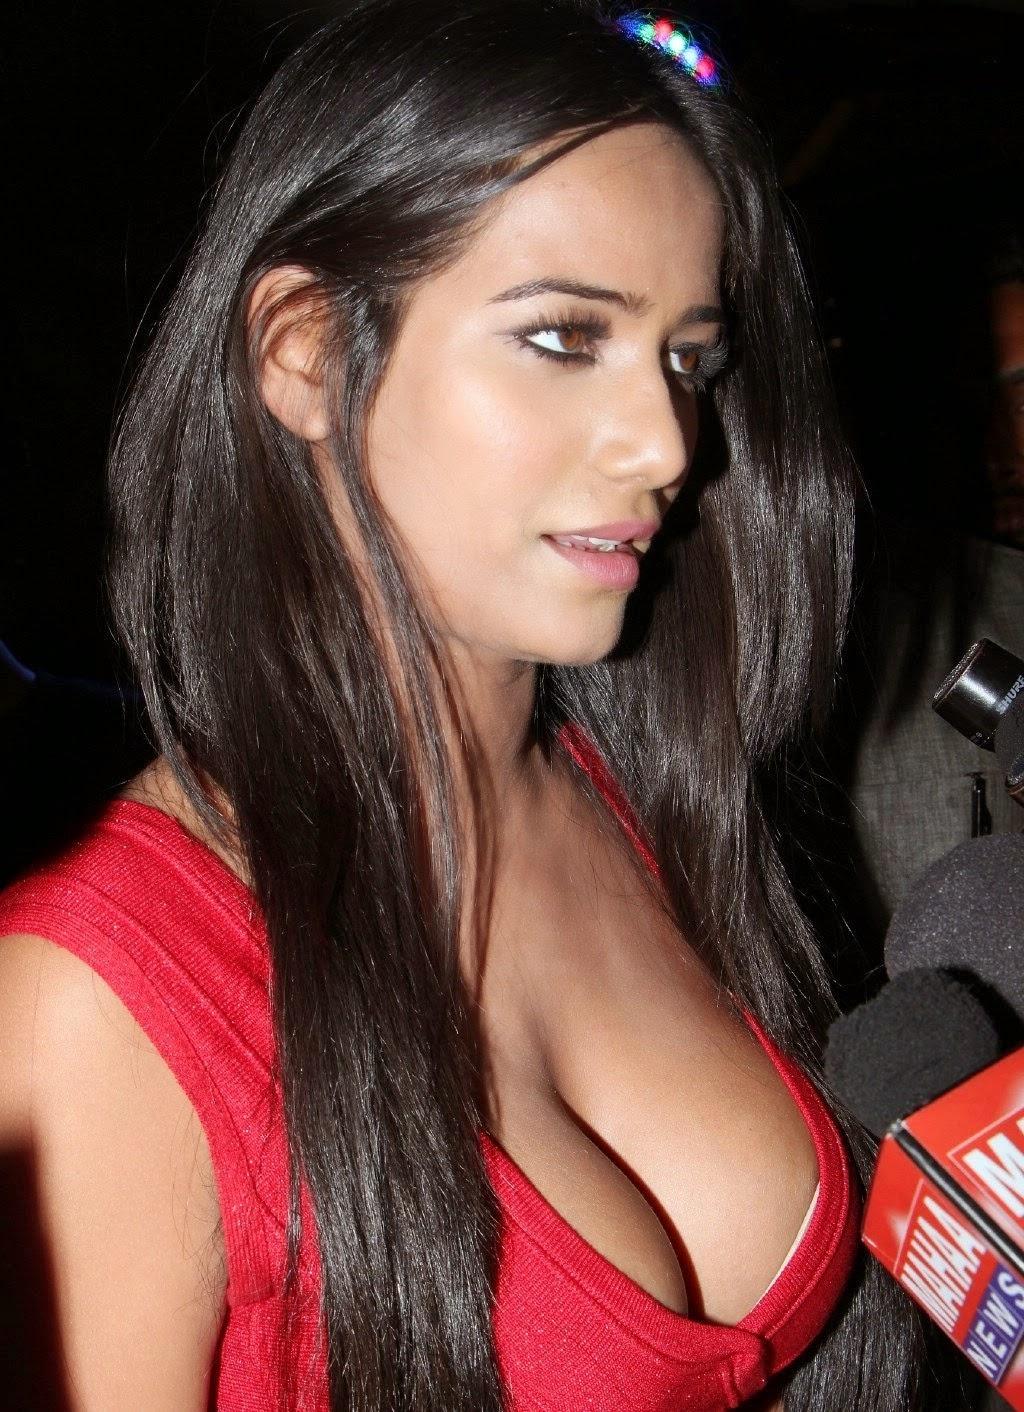 Poonam Pandey Hot Round Cleavage Exposed - Images-4442